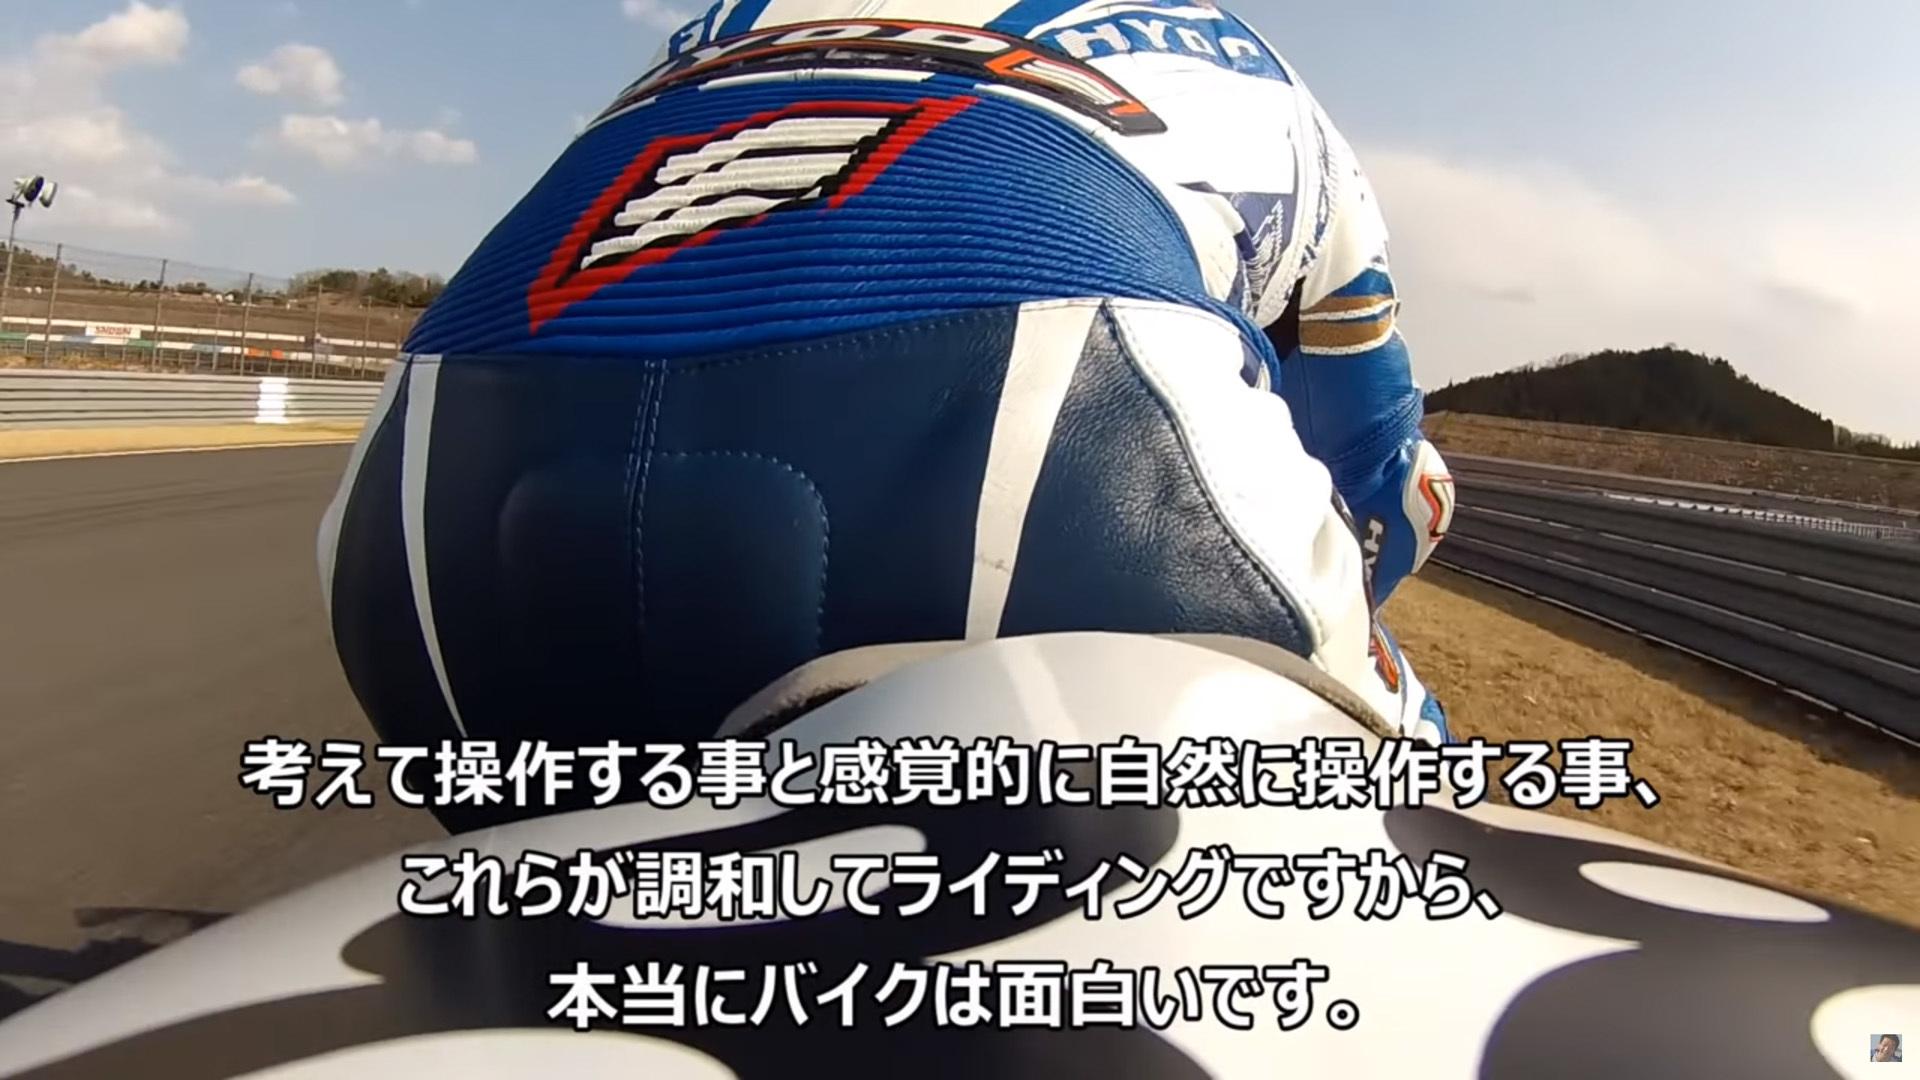 20190416_youtube_cap_sn88.jpg